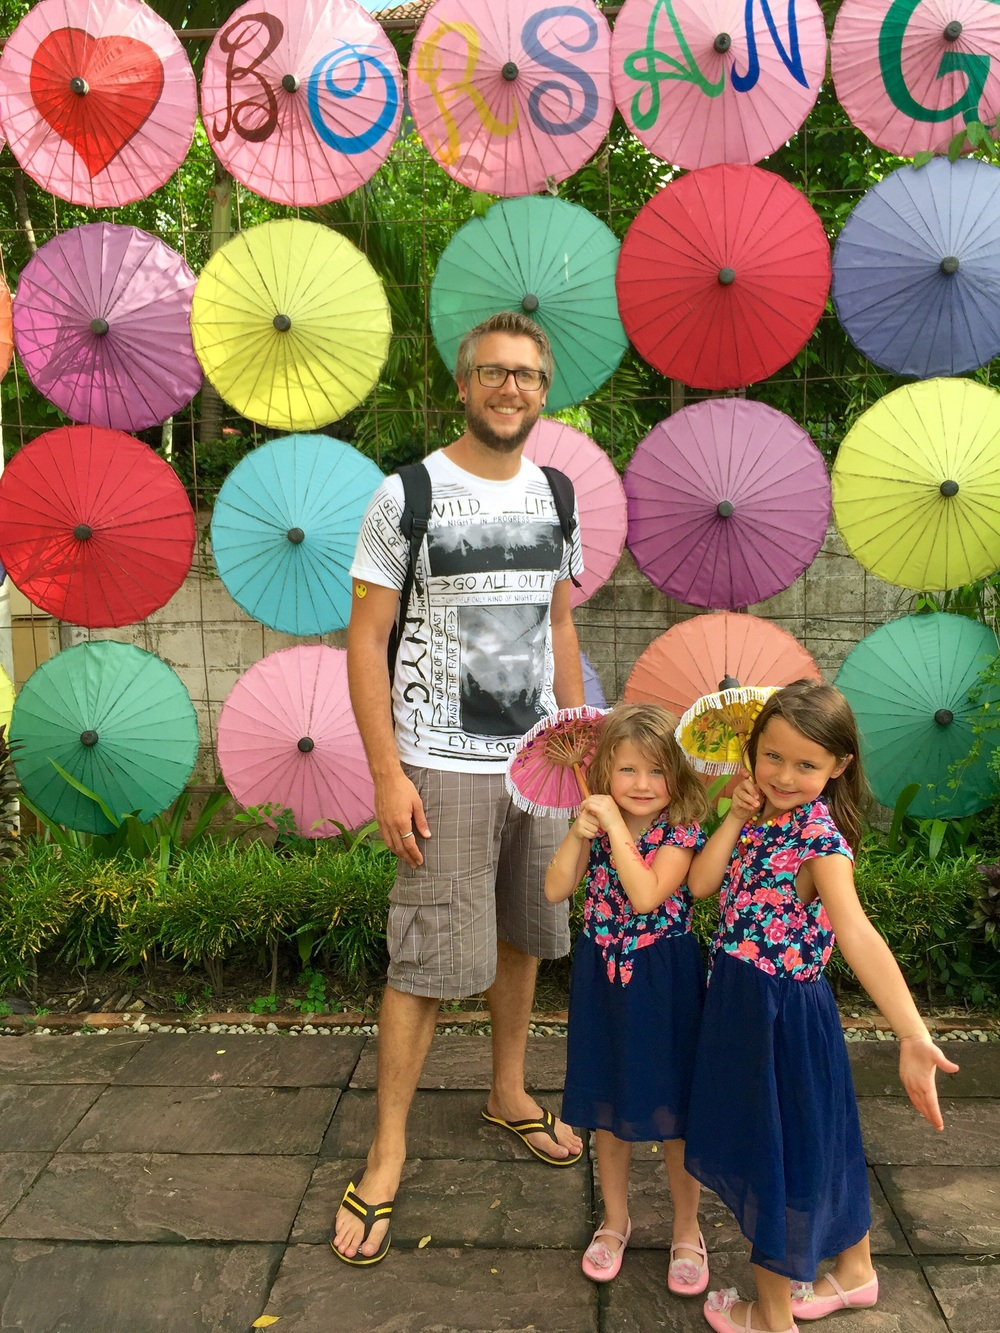 Joshua, Juliet, and Abby at Bo San Umbrella Village